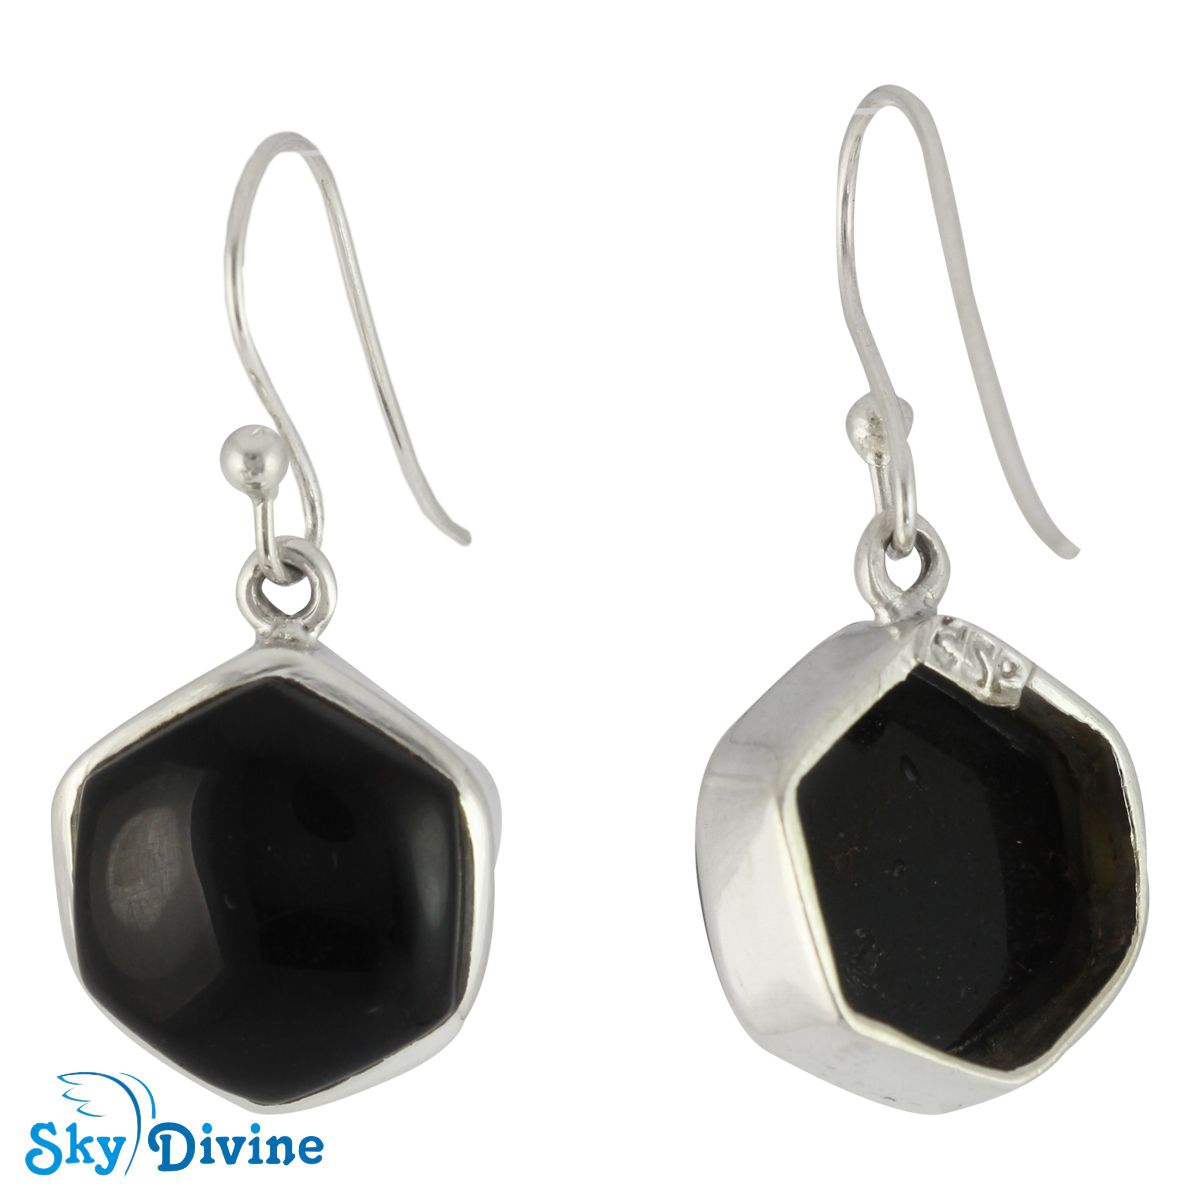 925 Sterling Silver Black onyx Earring SDER2112 | Sky Divine Jewellery, $58.44